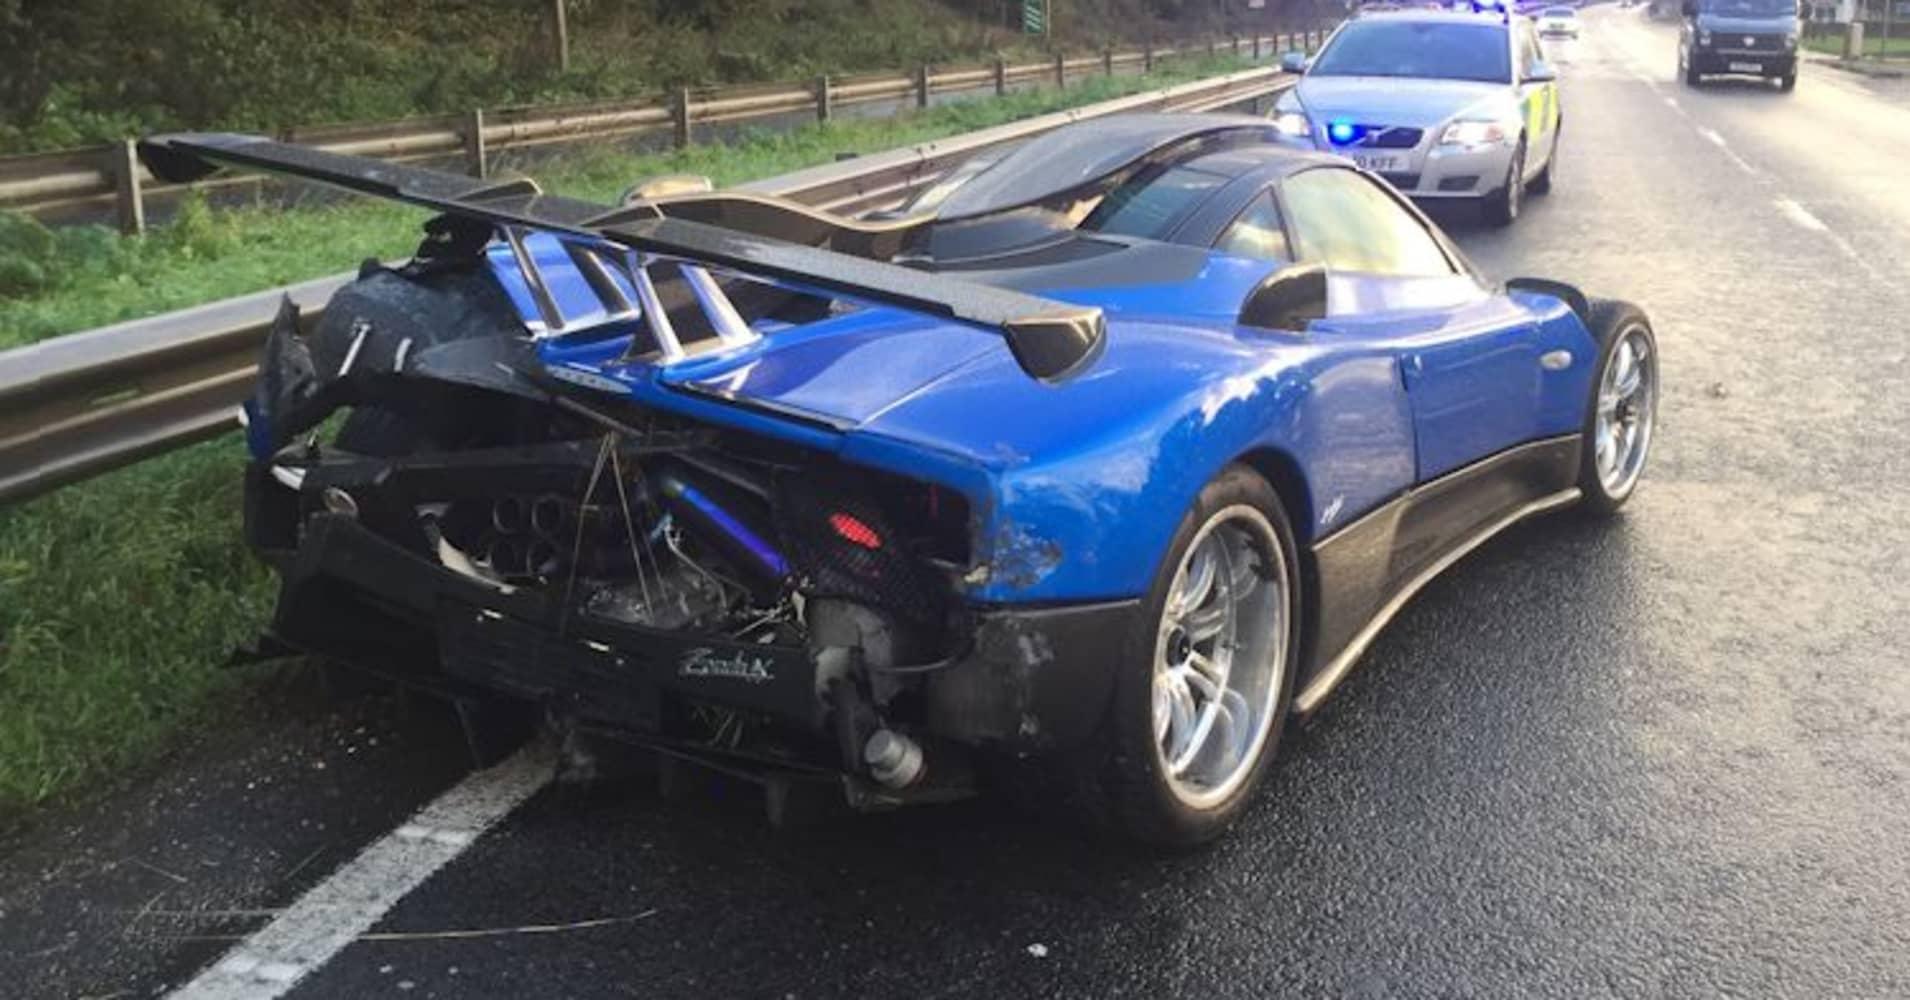 Pagani Zonda: 'One-off' $1.9 million supercar damaged in ...